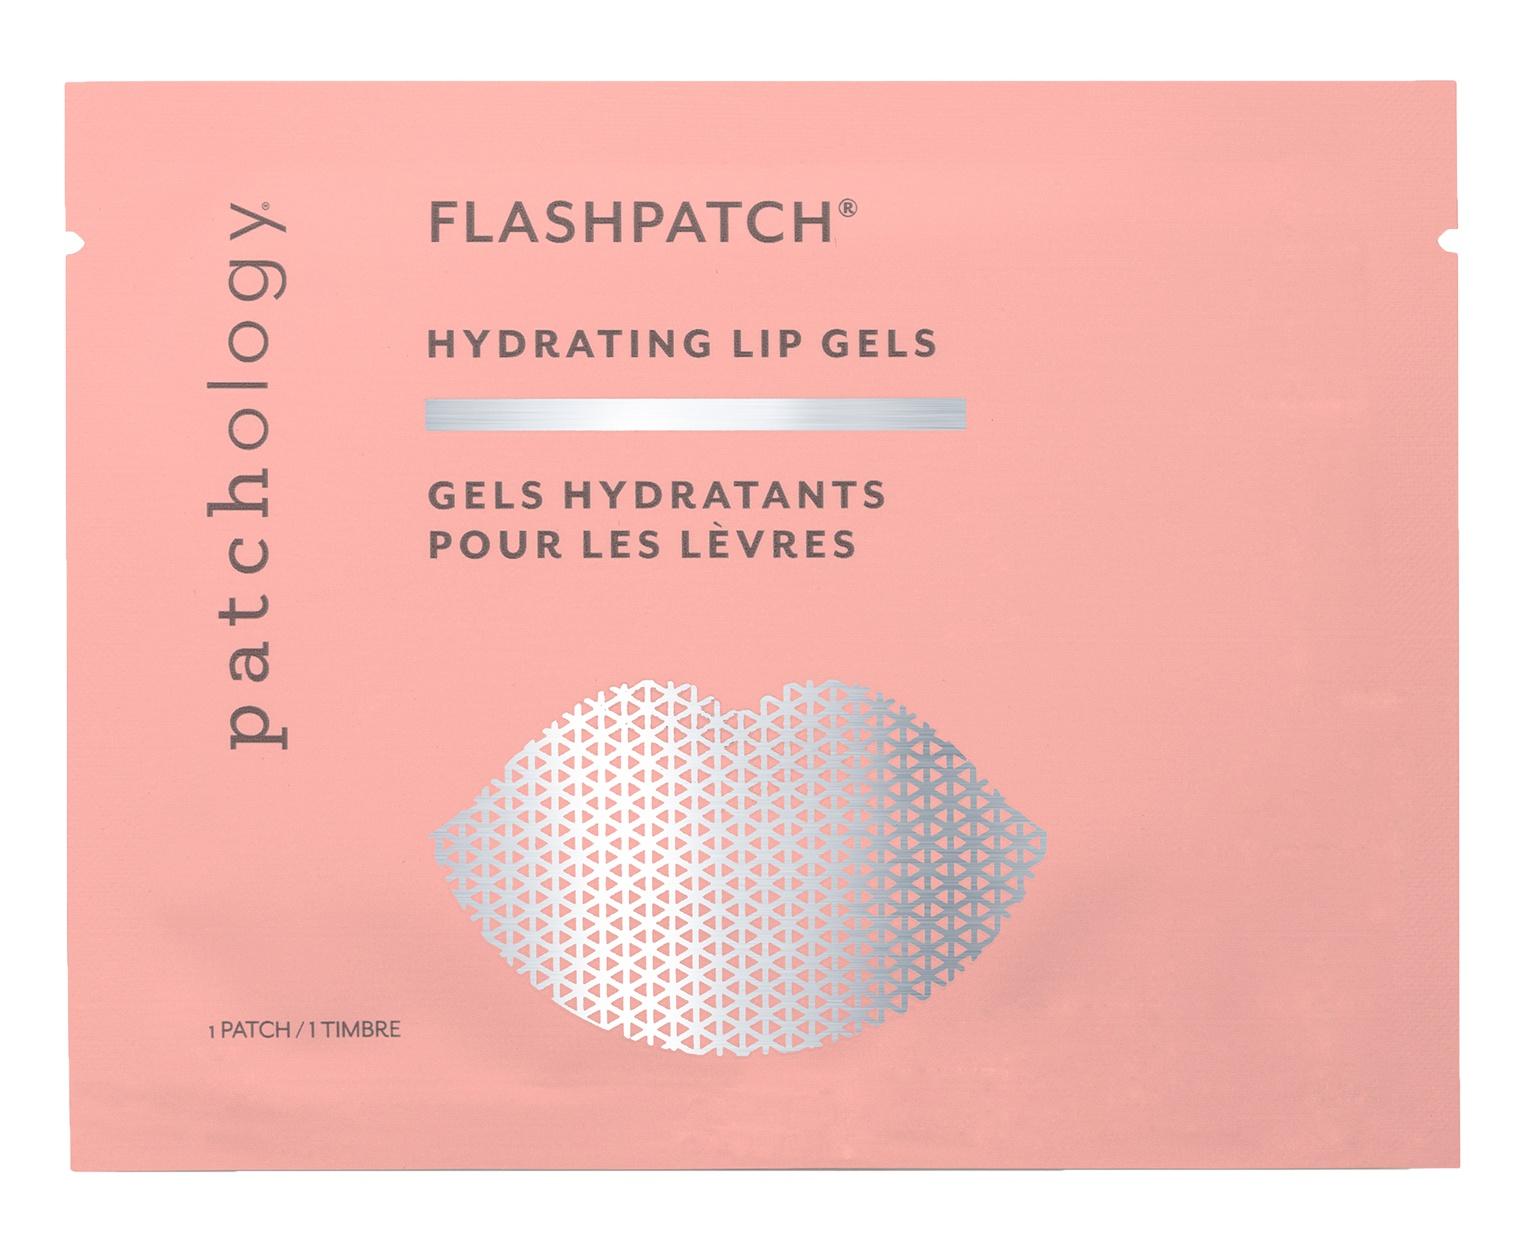 Patchology Flashpatch® Hydrating Lip Gels